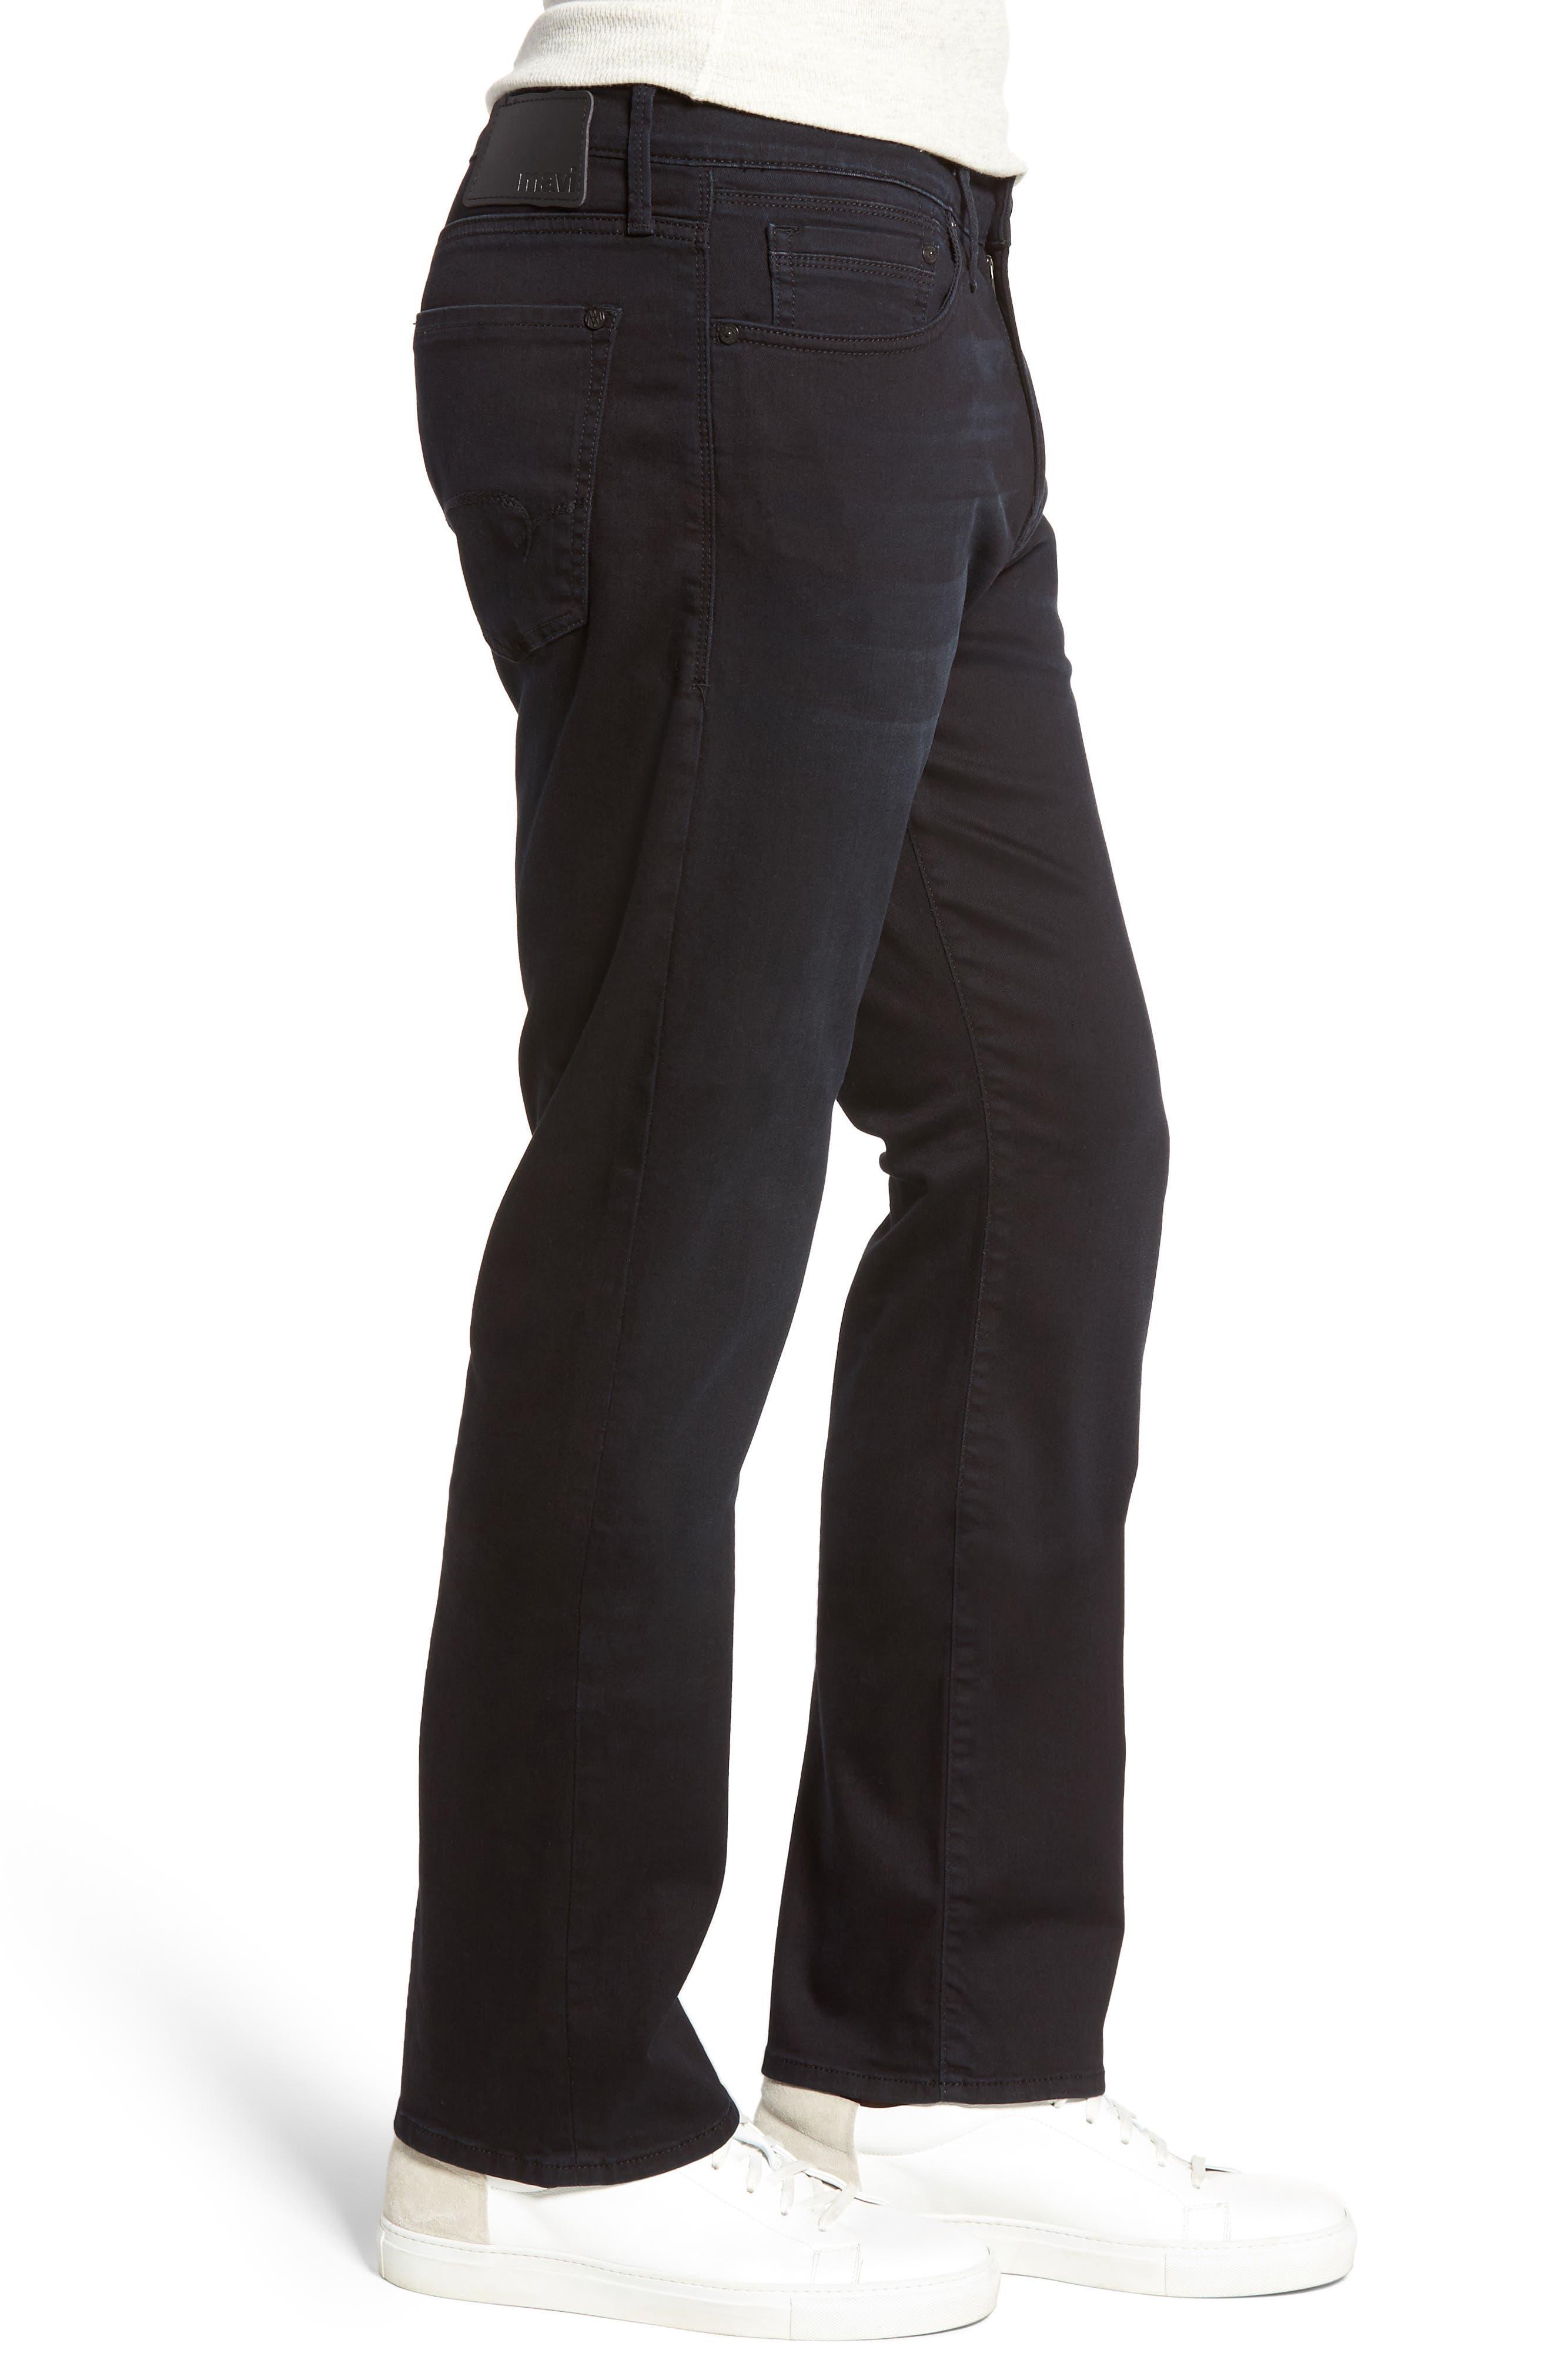 Matt Relaxed Fit Jeans,                             Alternate thumbnail 3, color,                             Blue Black